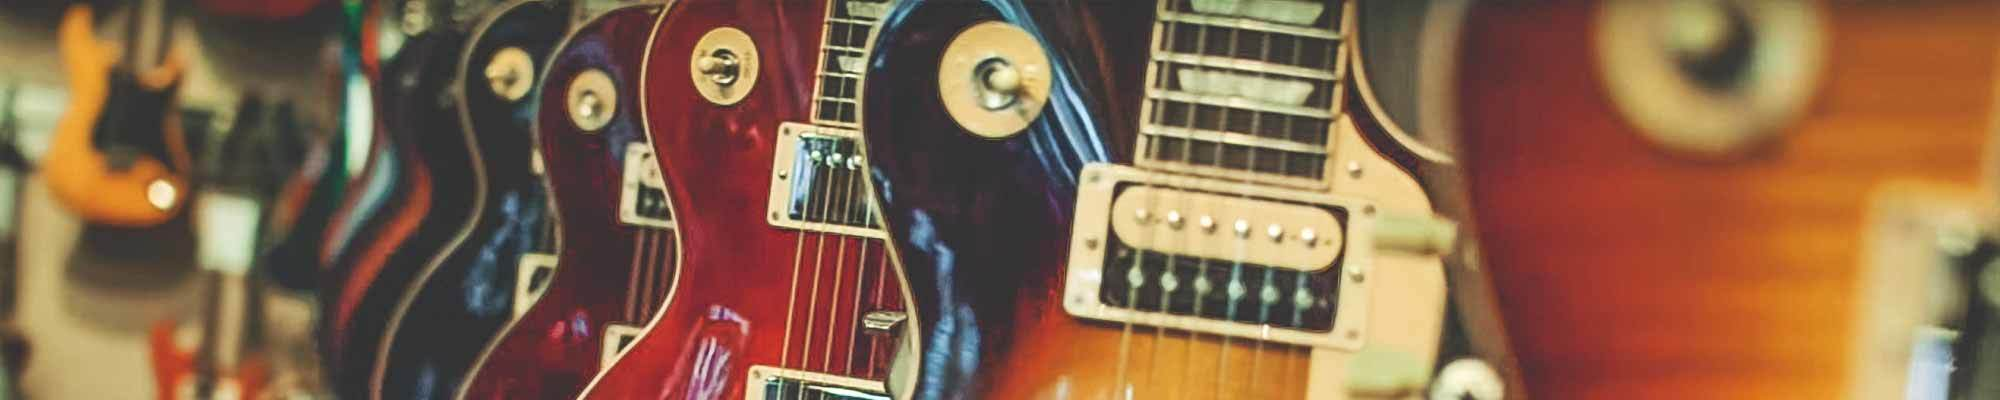 Gibson In Parts Reverb 500t Super Ceramic Bridge Humbucker Electric Guitar Pickup